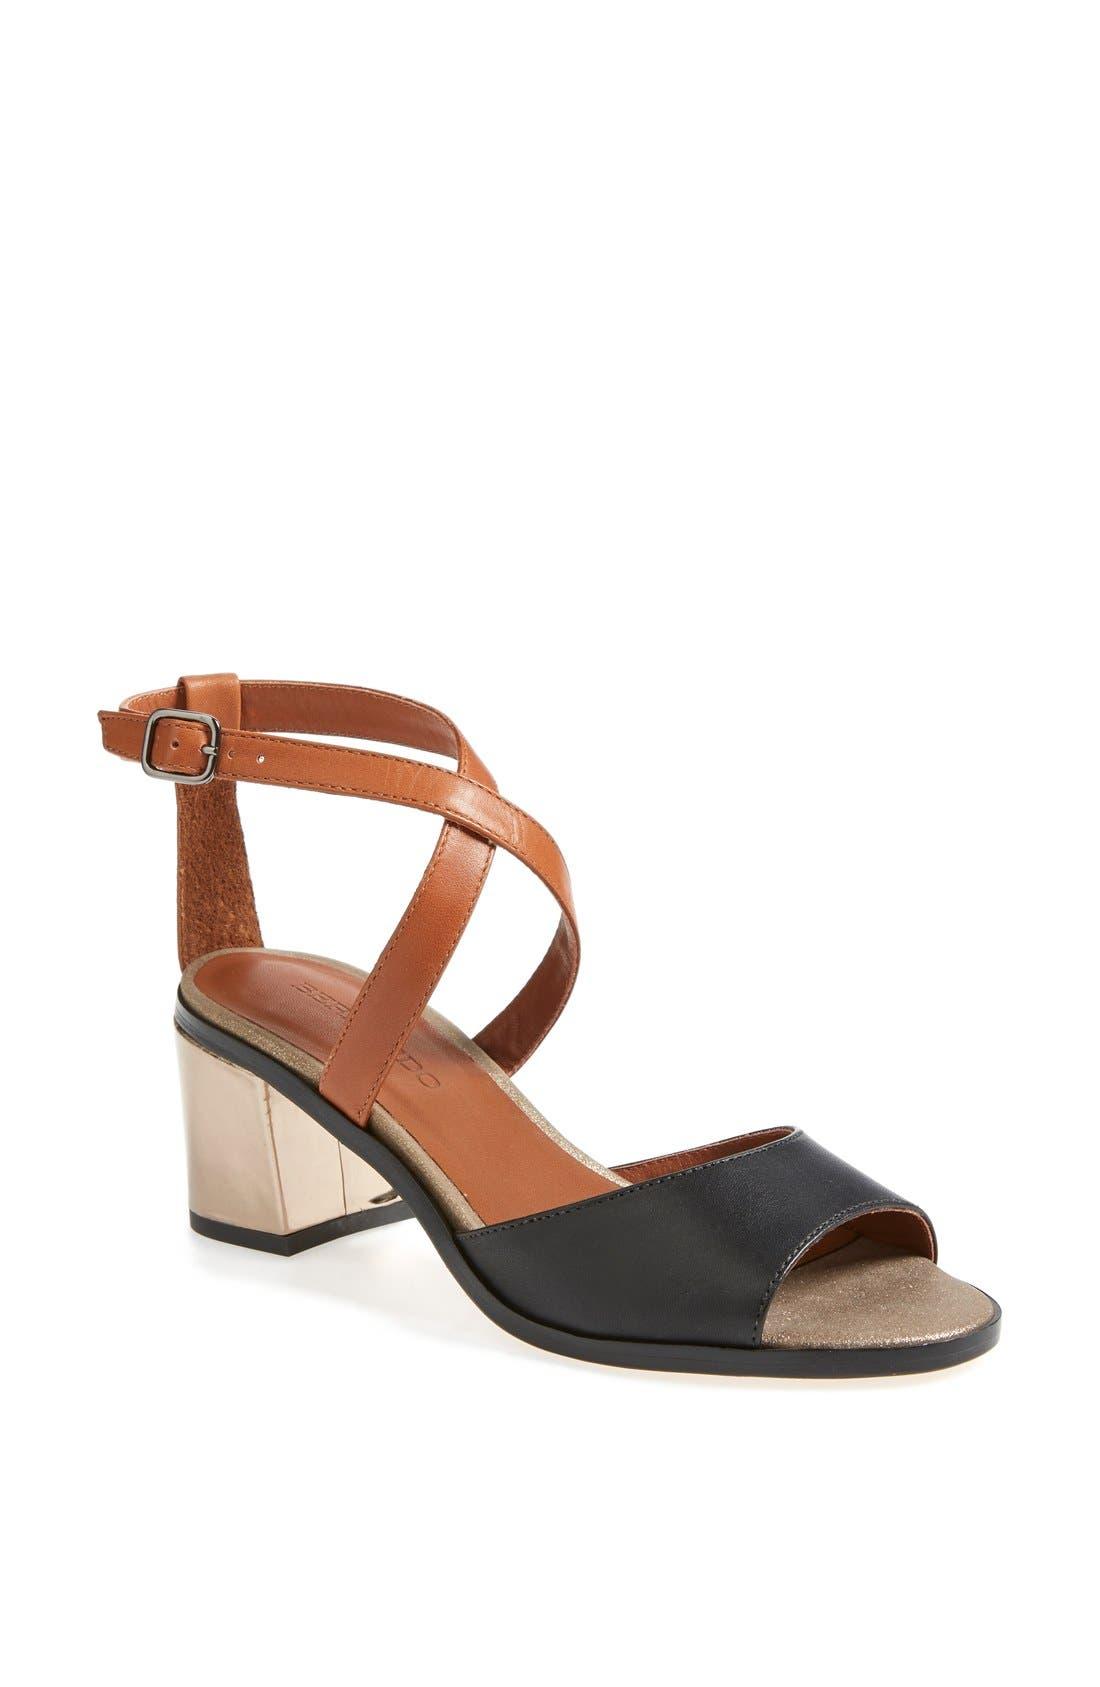 Alternate Image 1 Selected - Bernardo Footwear Sandal